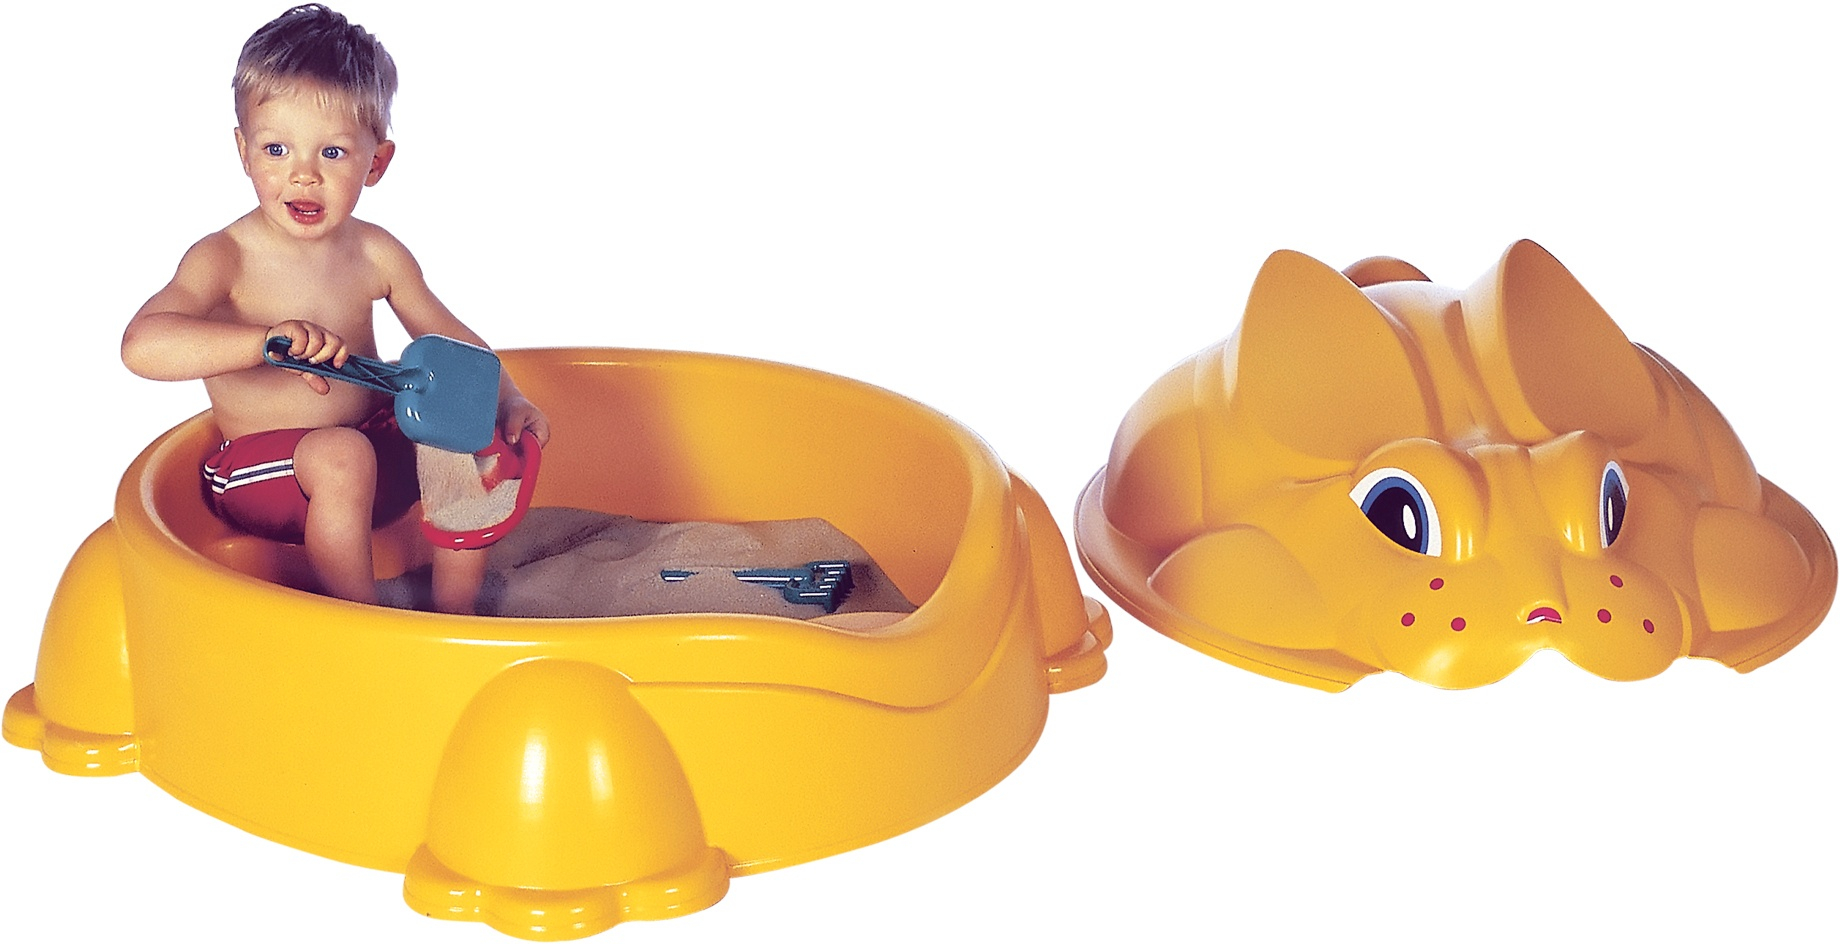 Paradiso Toys sandkasten konijn84 x 92 cm gelb